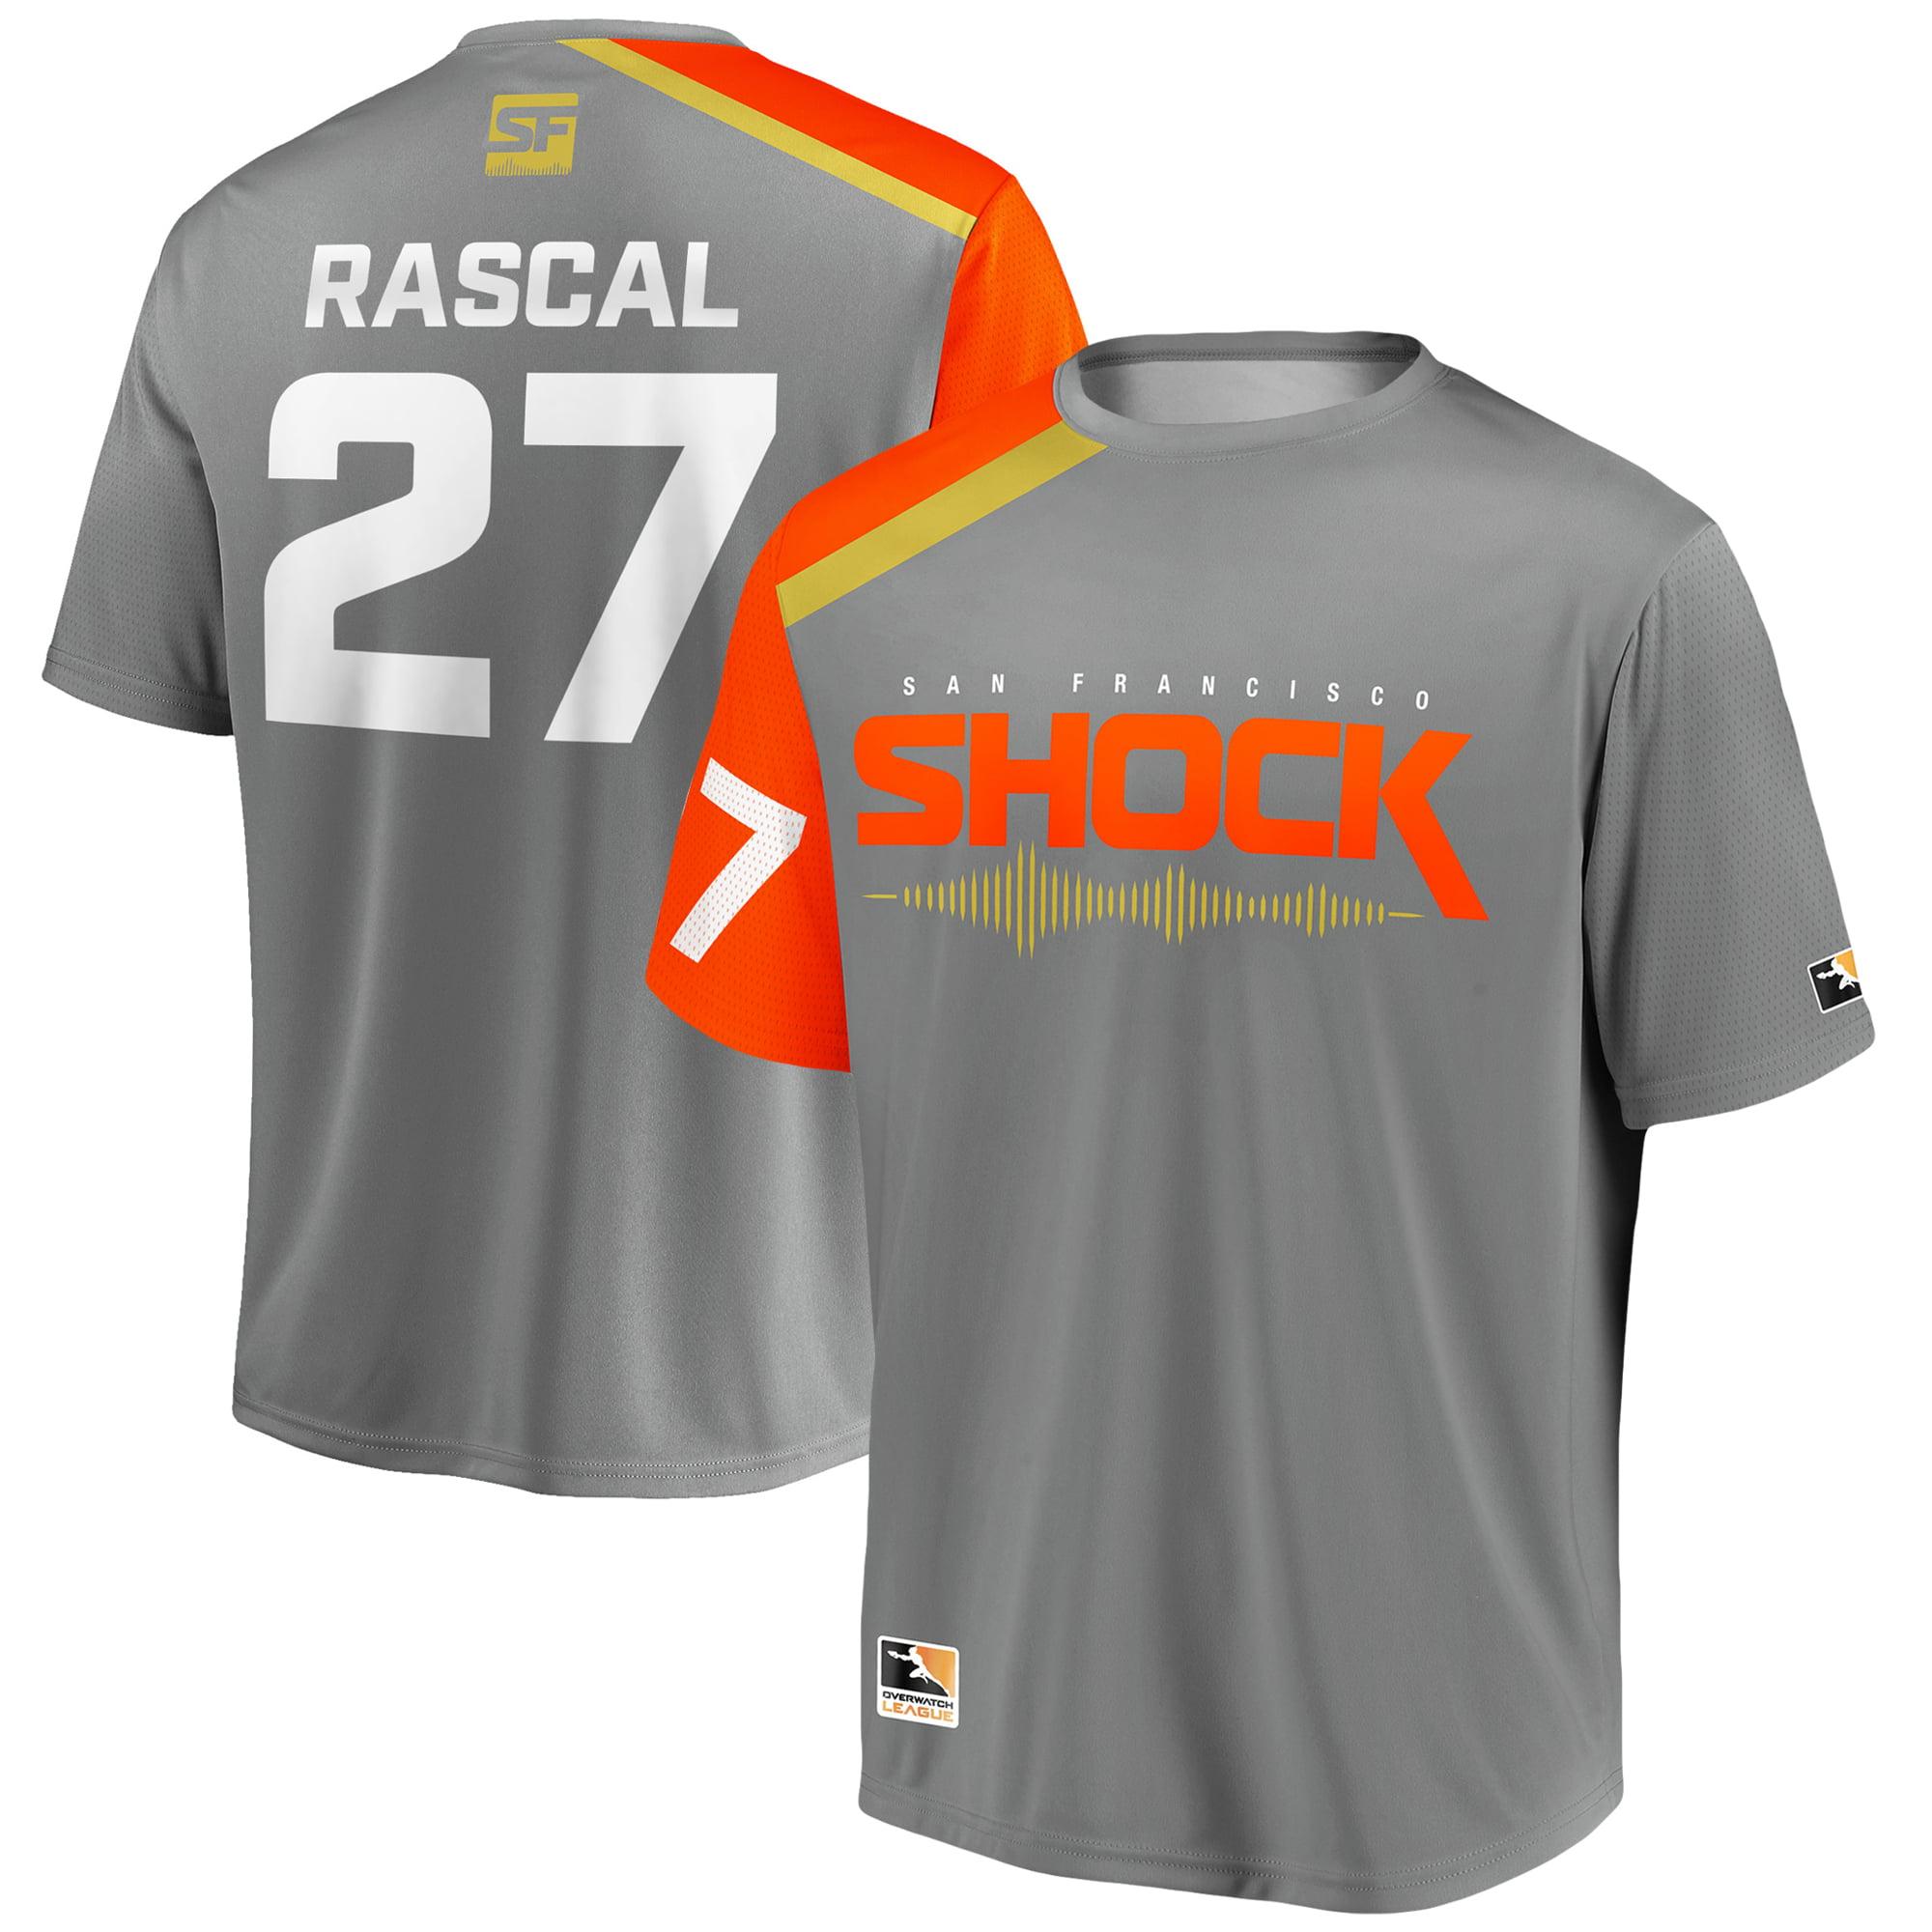 Rascal San Francisco Shock Overwatch League Replica Home Jersey - Gray